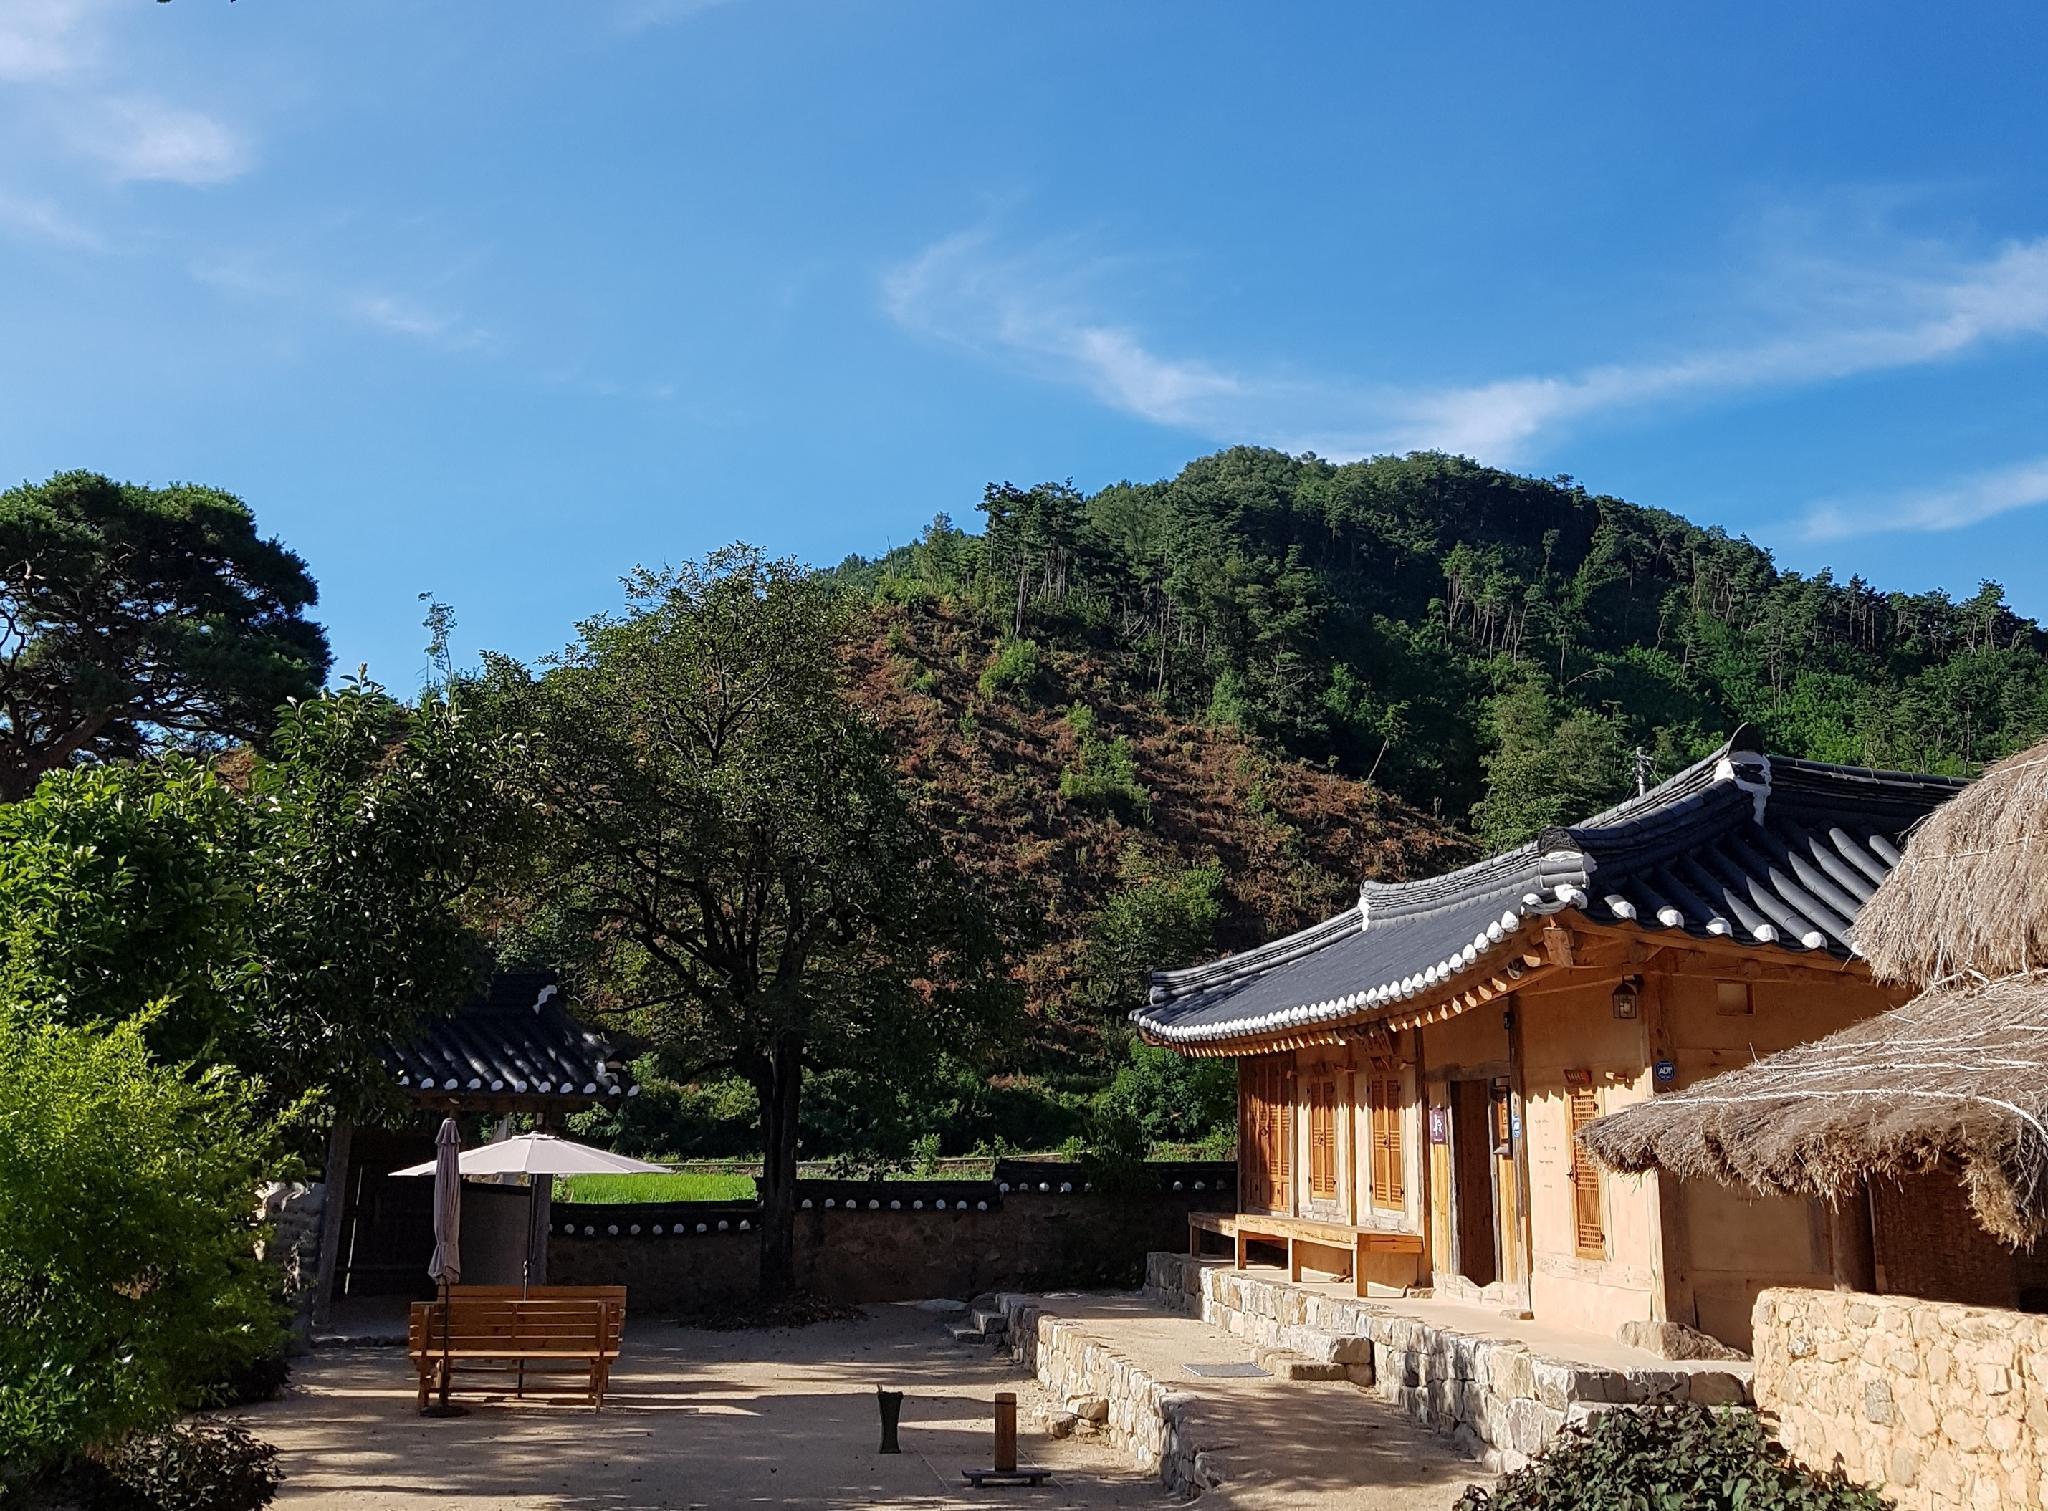 Jukheon Traditional House